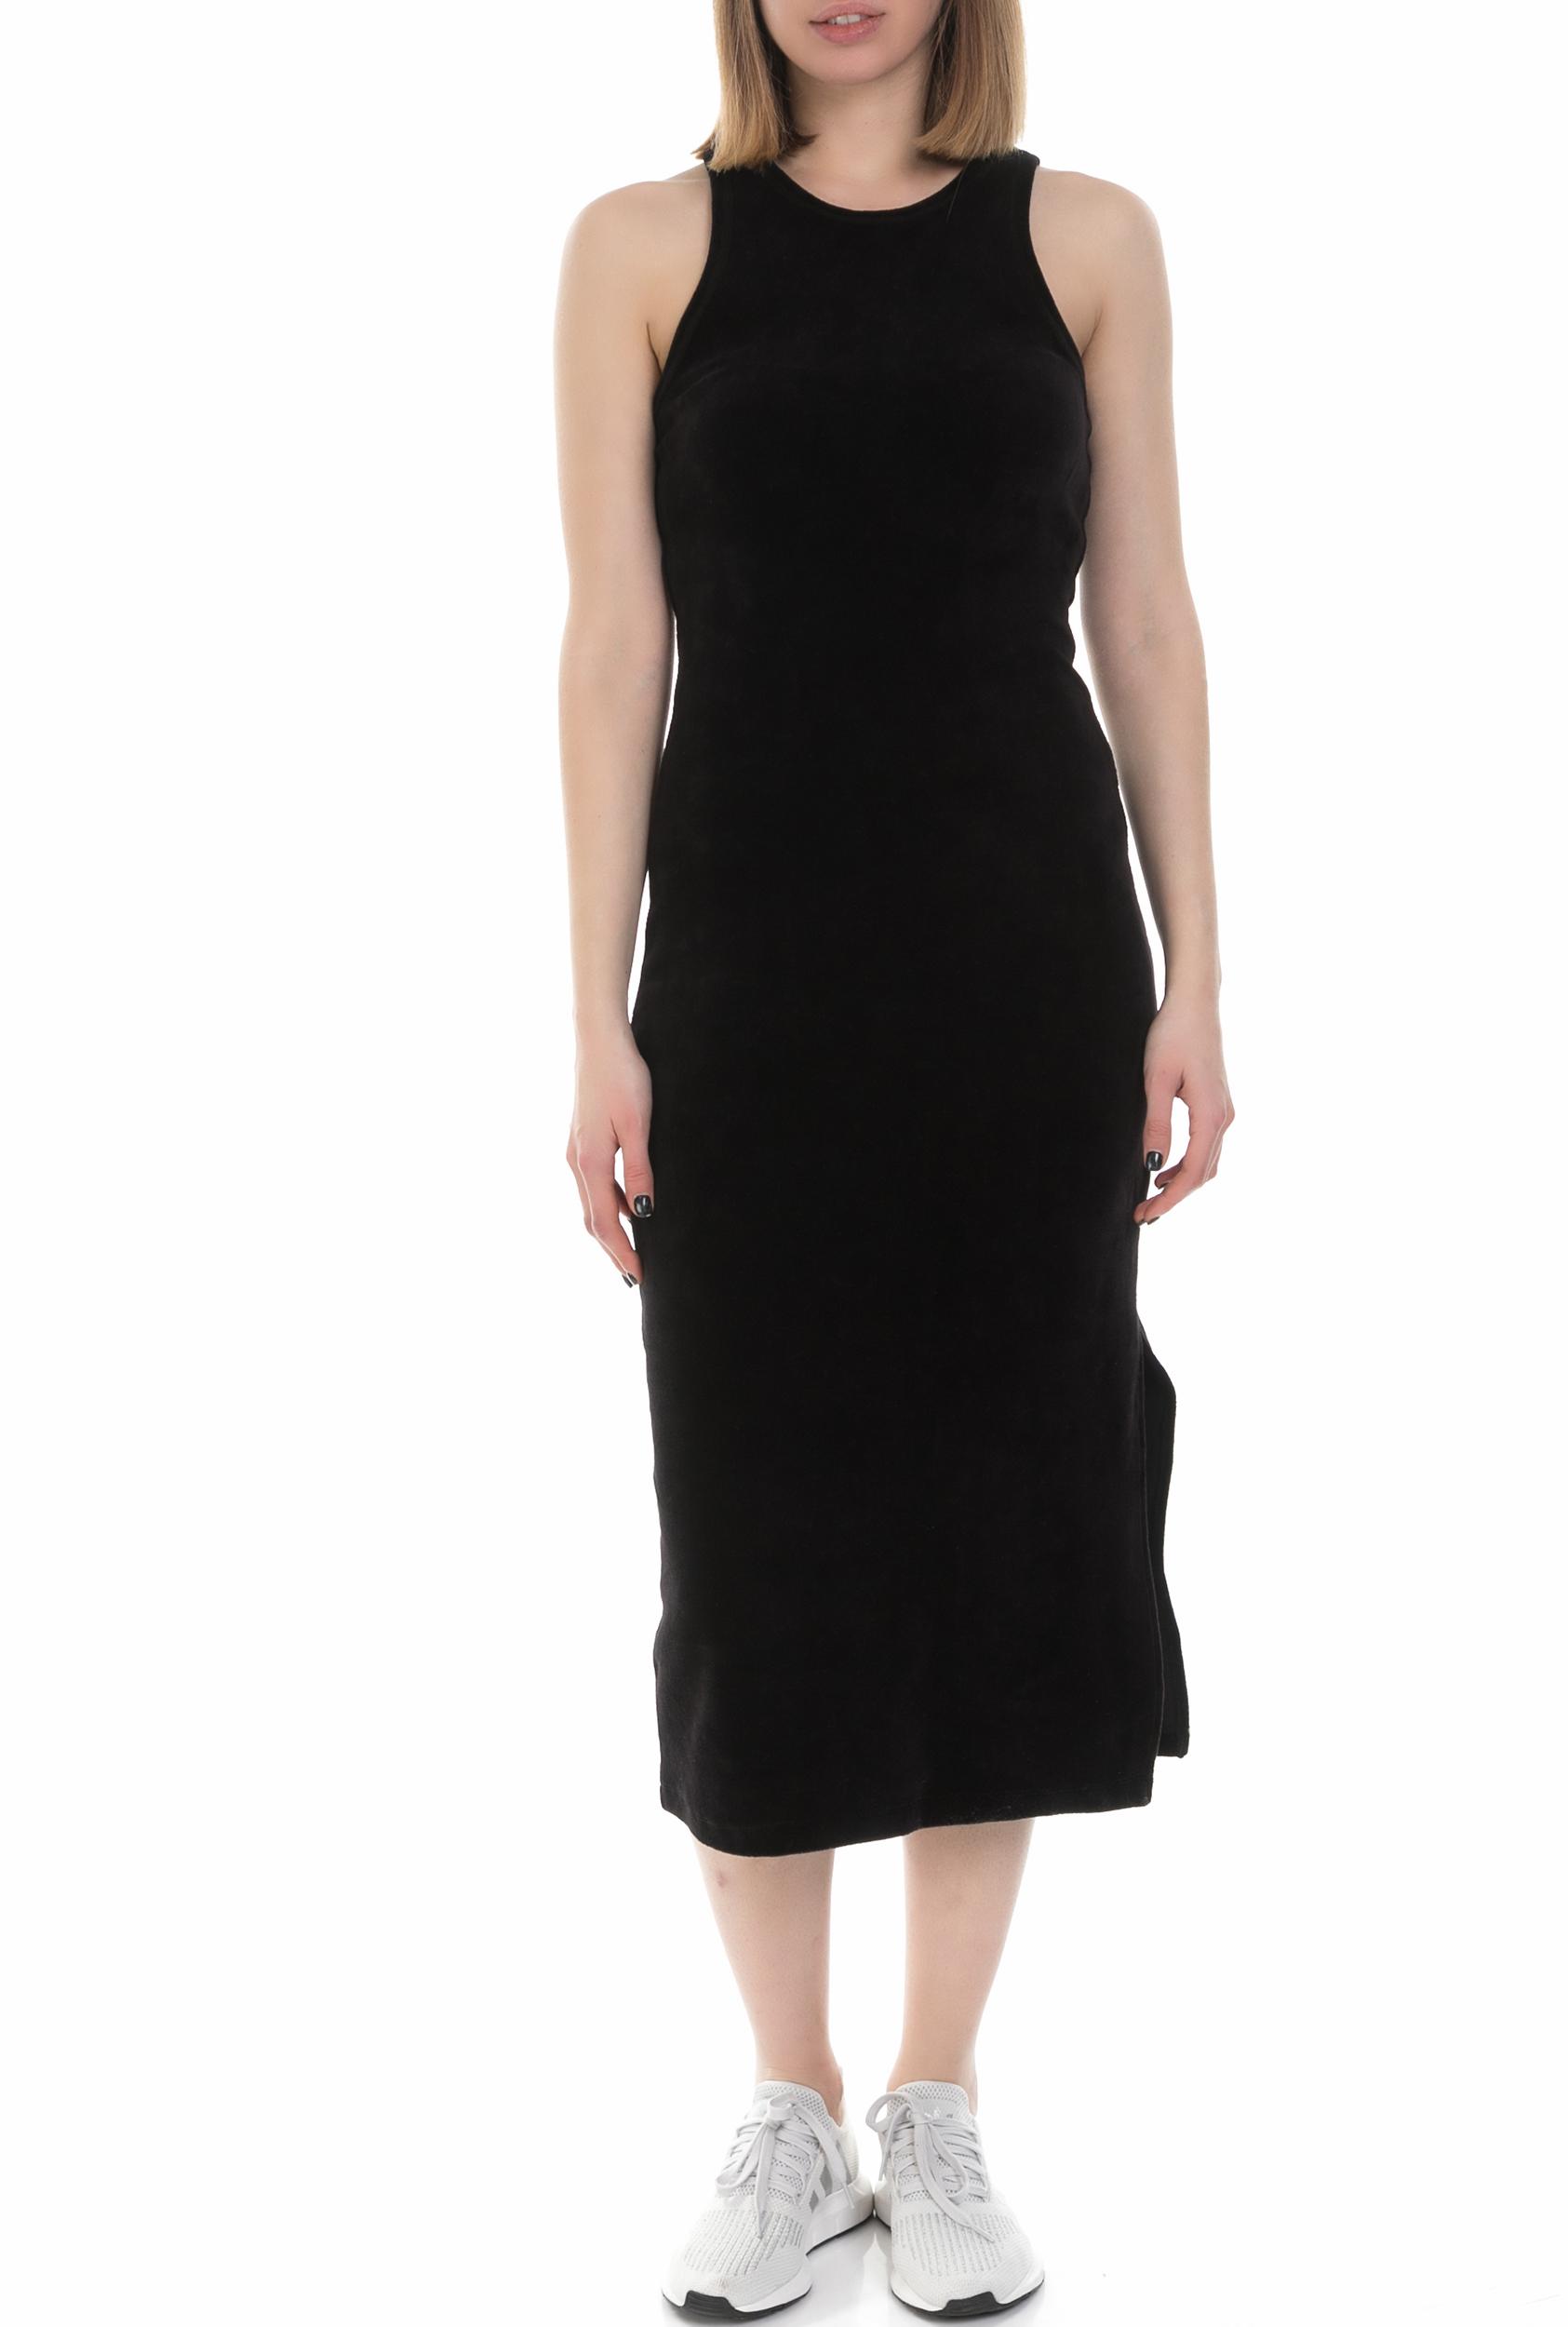 JUICY COUTURE - Γυναικείο αμάνικο midi φόρεμα Juicy Couture μαύρο γυναικεία ρούχα φορέματα μέχρι το γόνατο